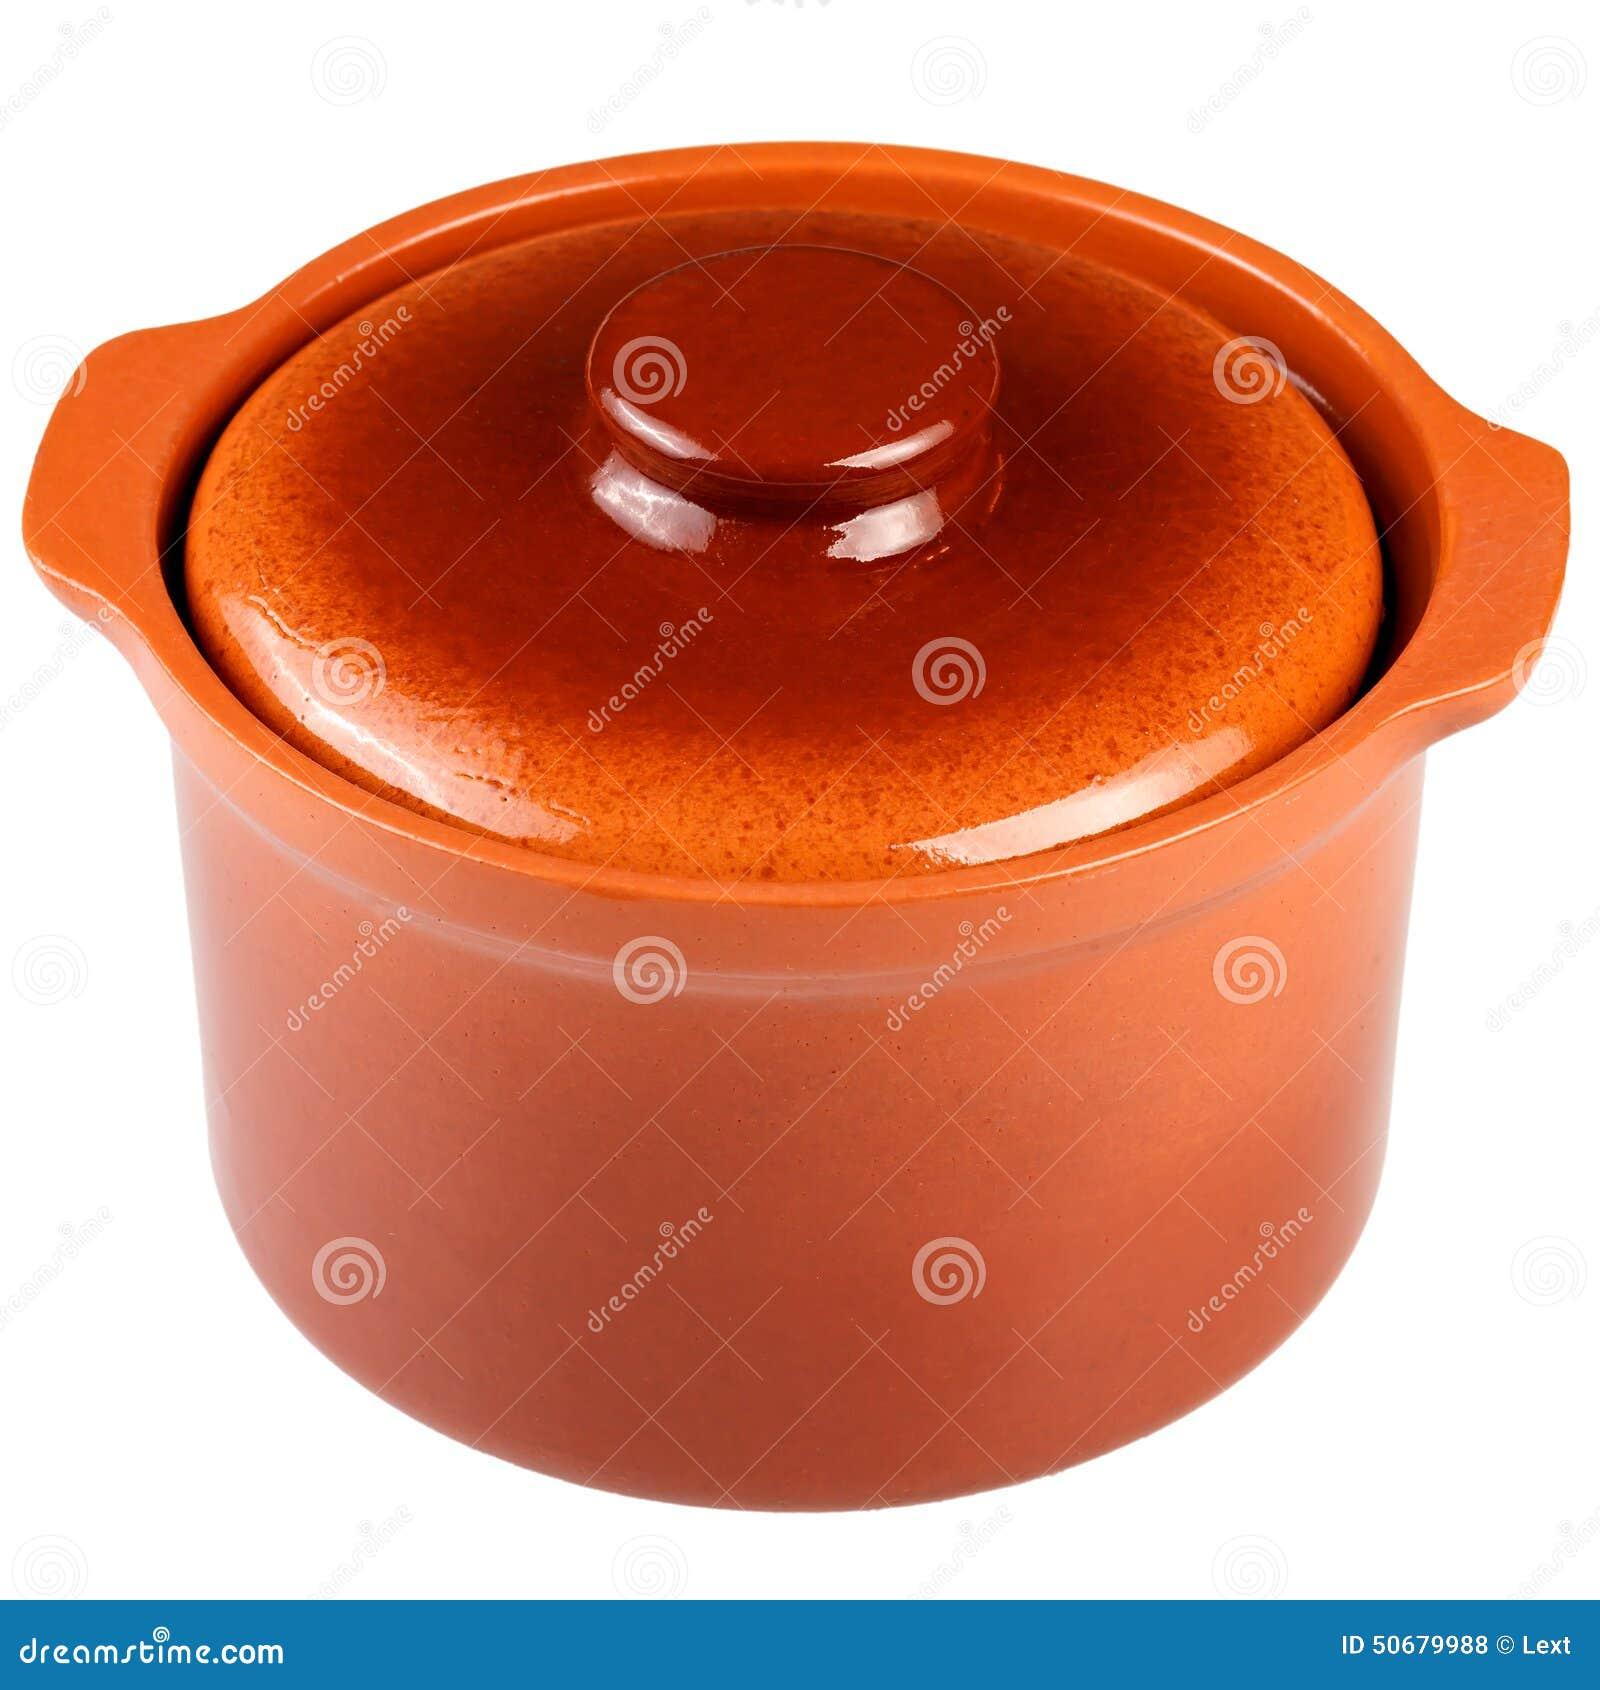 Download 烹调的泥罐 库存照片. 图片 包括有 对象, 空白, 粗陶器, 食物, 陶瓷, 陶器, 设备, 点心, 弯脚的 - 50679988